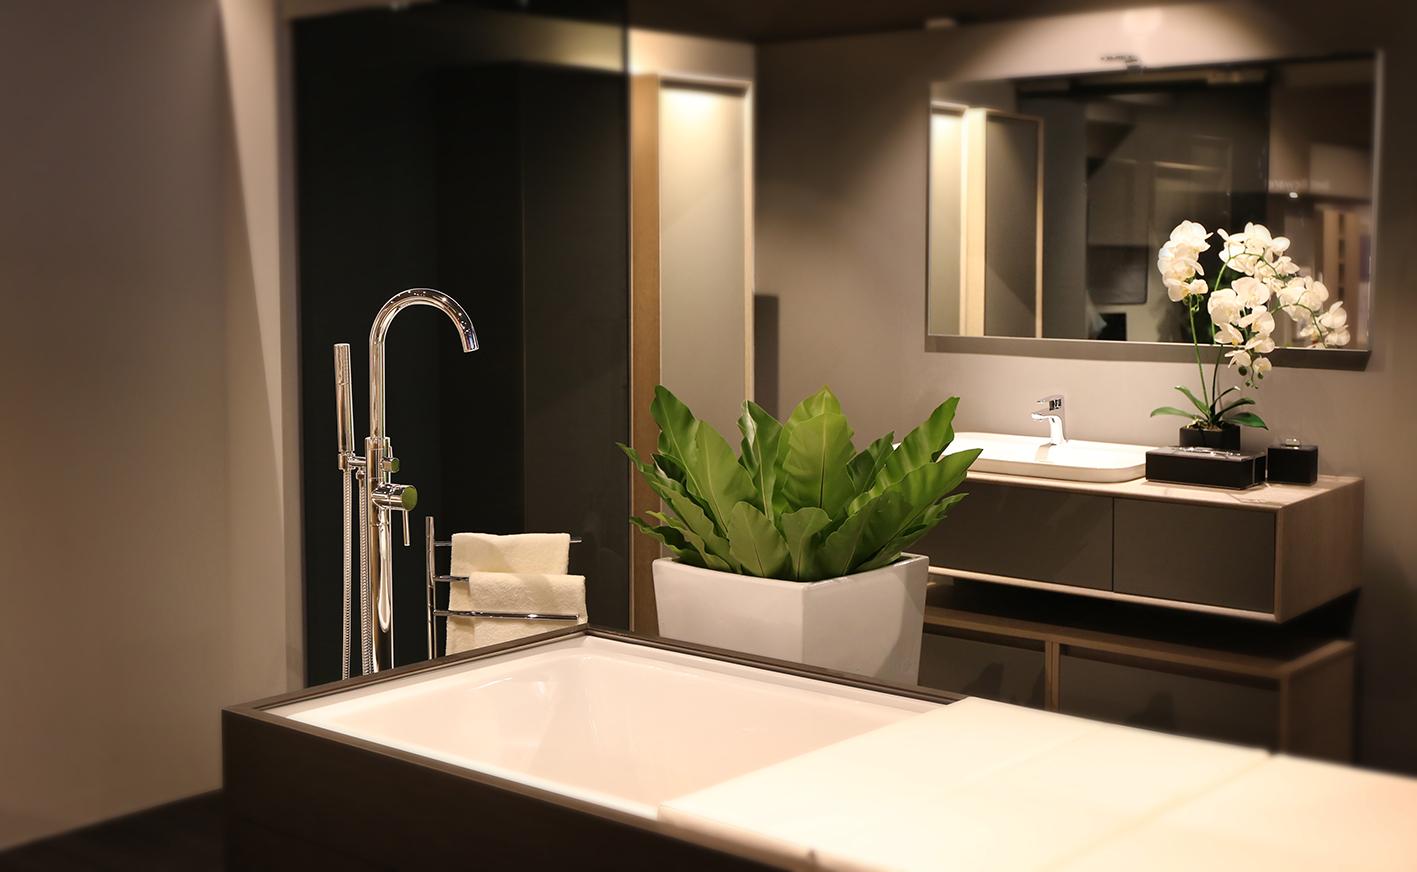 Crestial Eins+ Bath Mixer